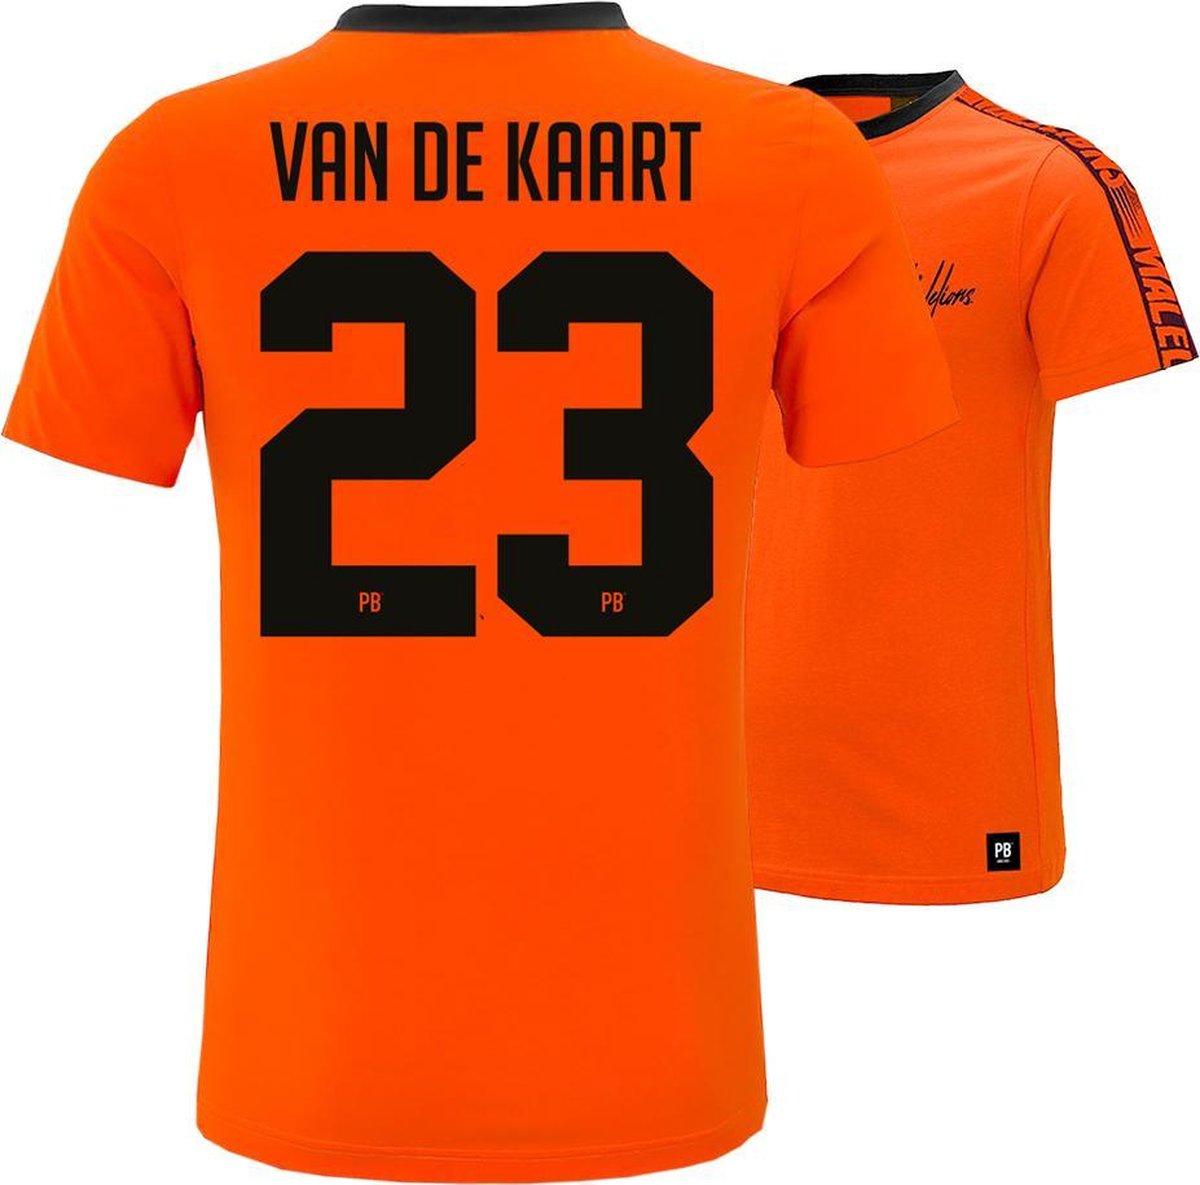 PB x Malelions - 23. Van de Kaart   Maat M   Oranje T-shirt   EK voetbal 2021   Heren en dames